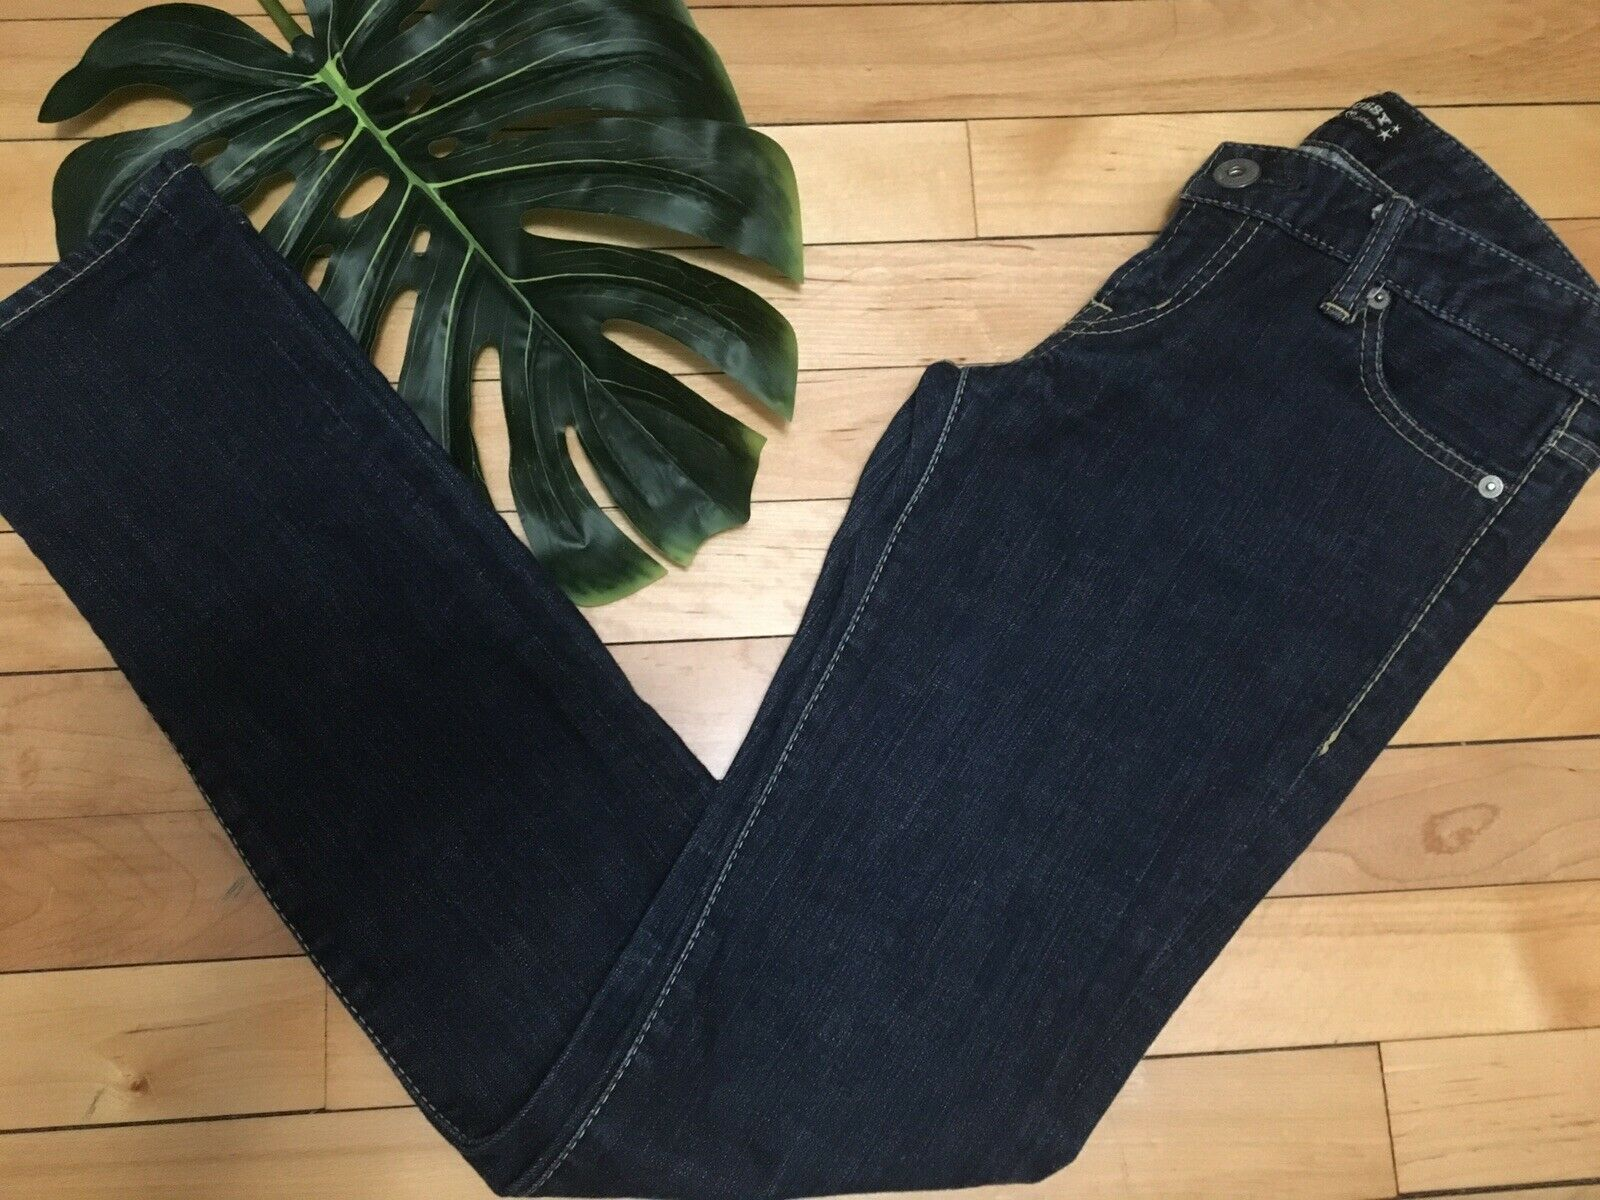 MOUSSY Women's jeans Dark Wash Straight Leg Low Rise Sz 26 Inseam 30